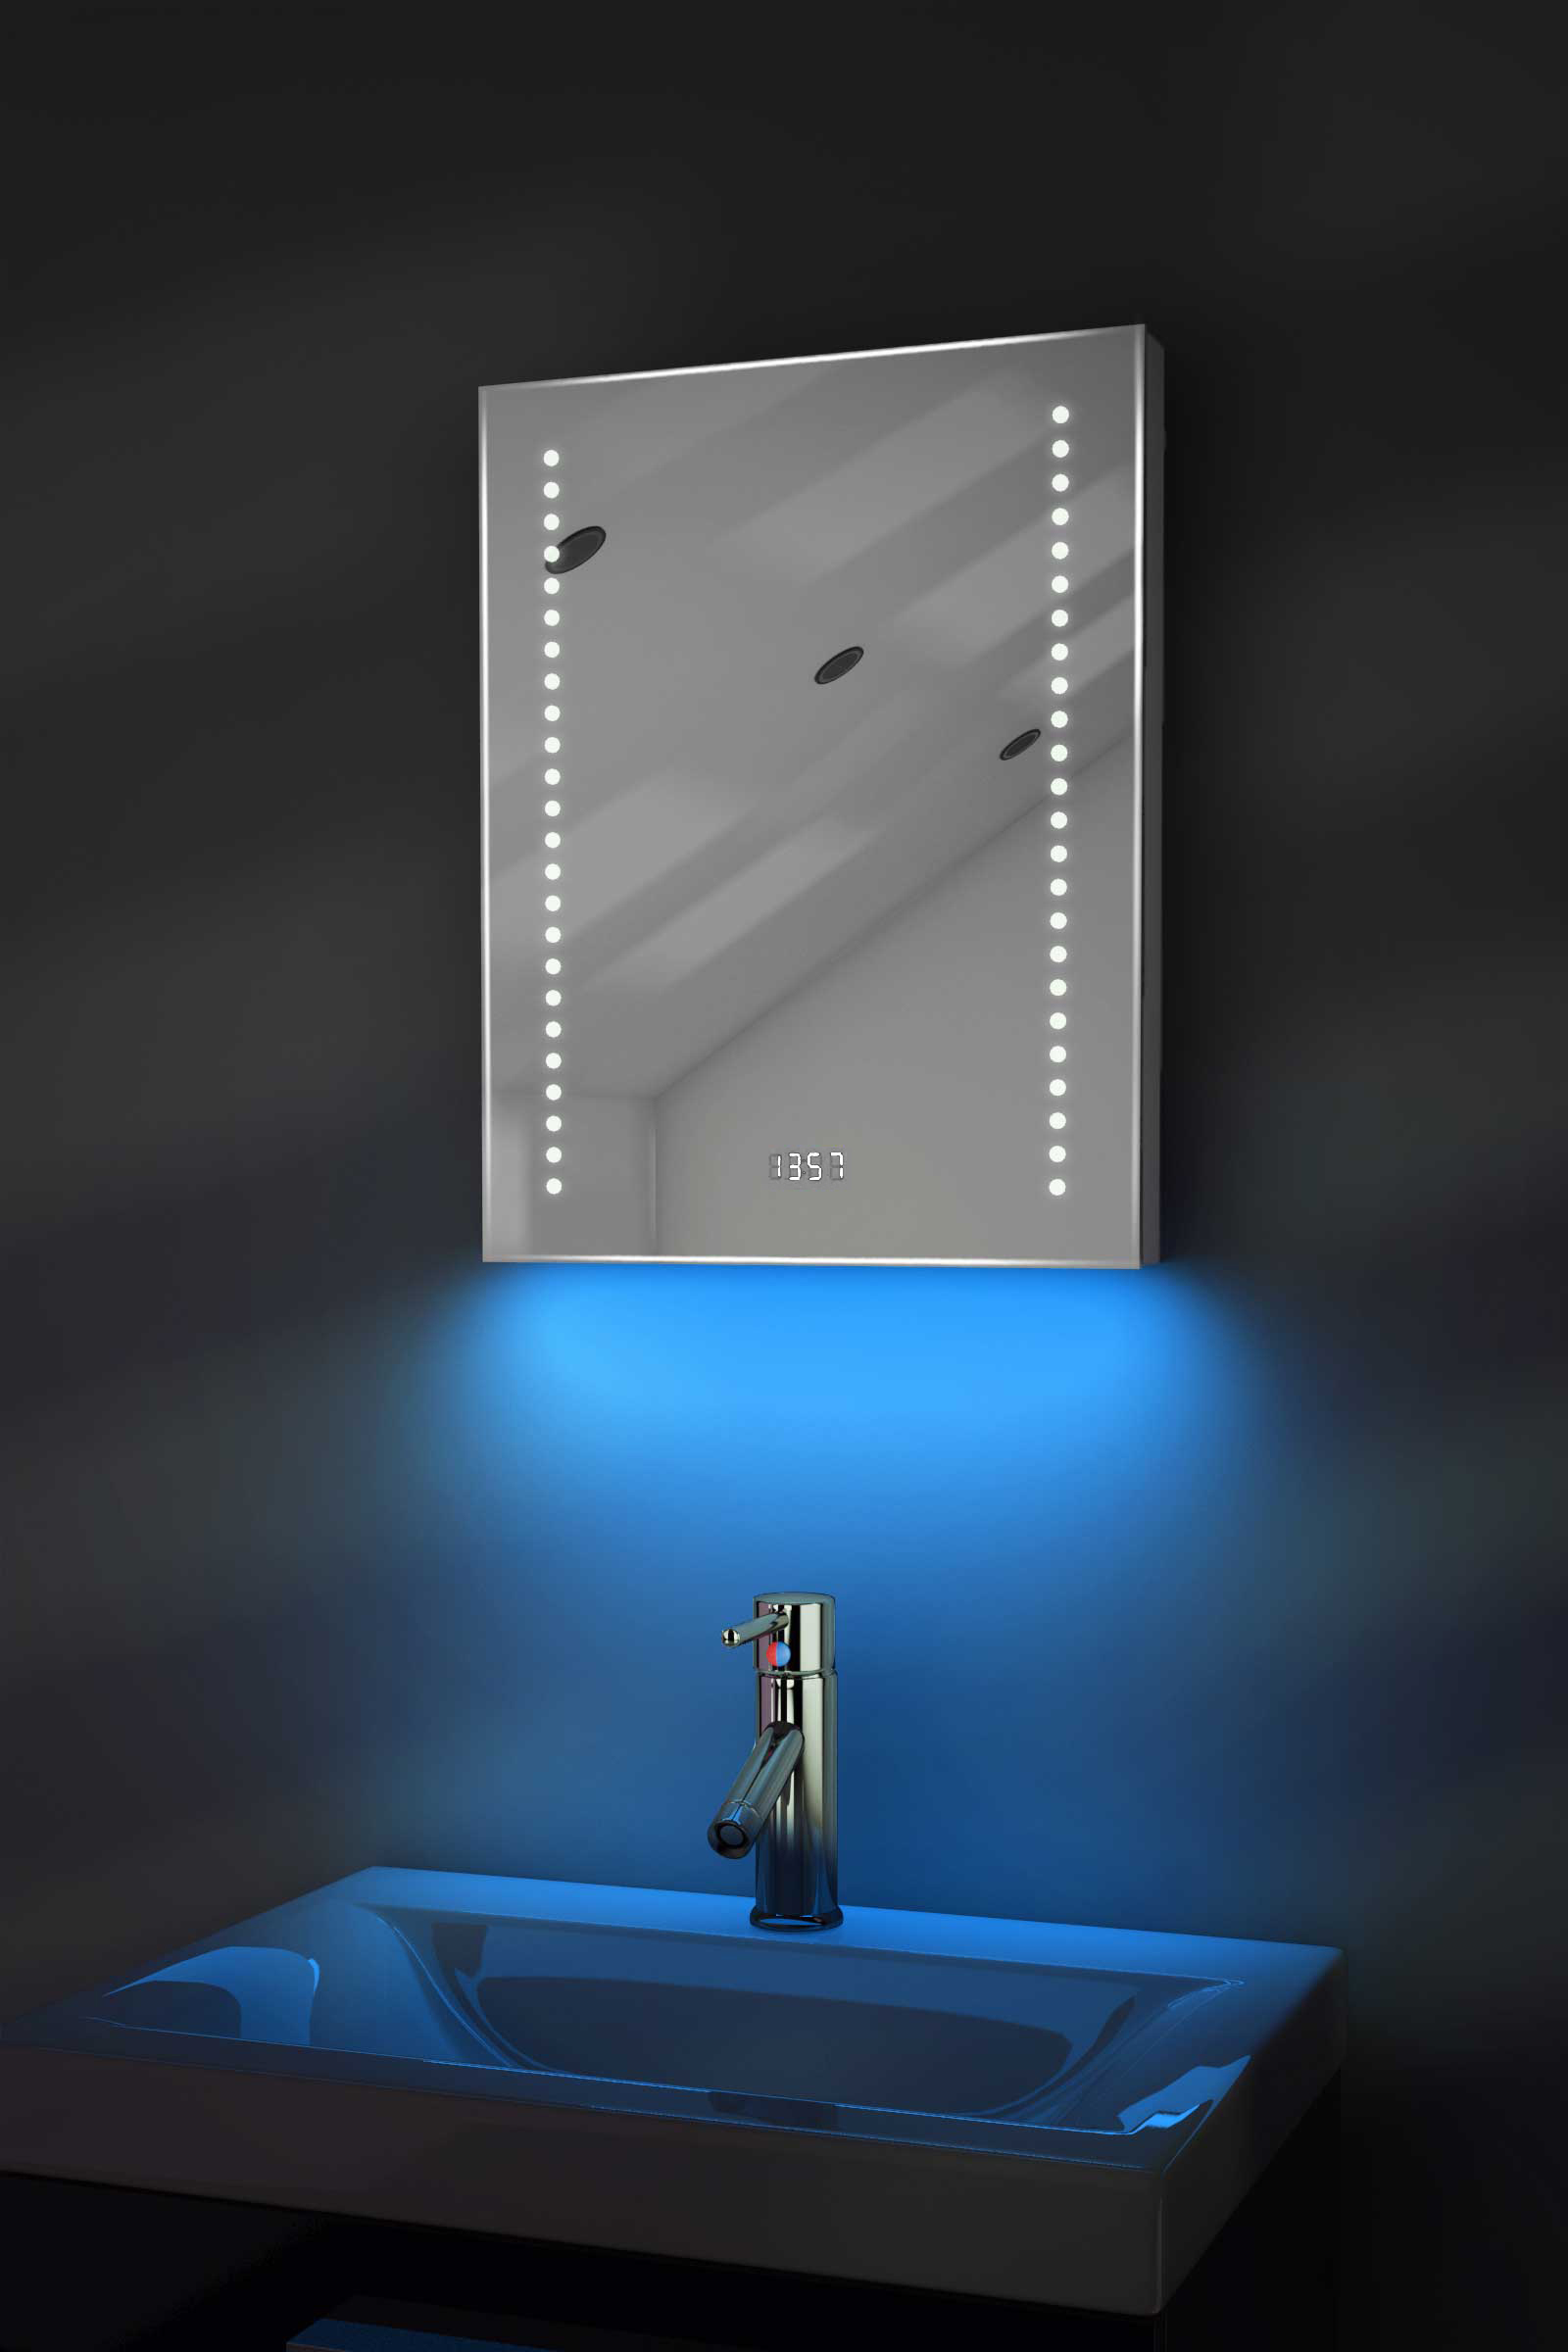 Digital Clock Shaver Bathroom Mirror With Under Lighting Demist Sensor K189b Ebay